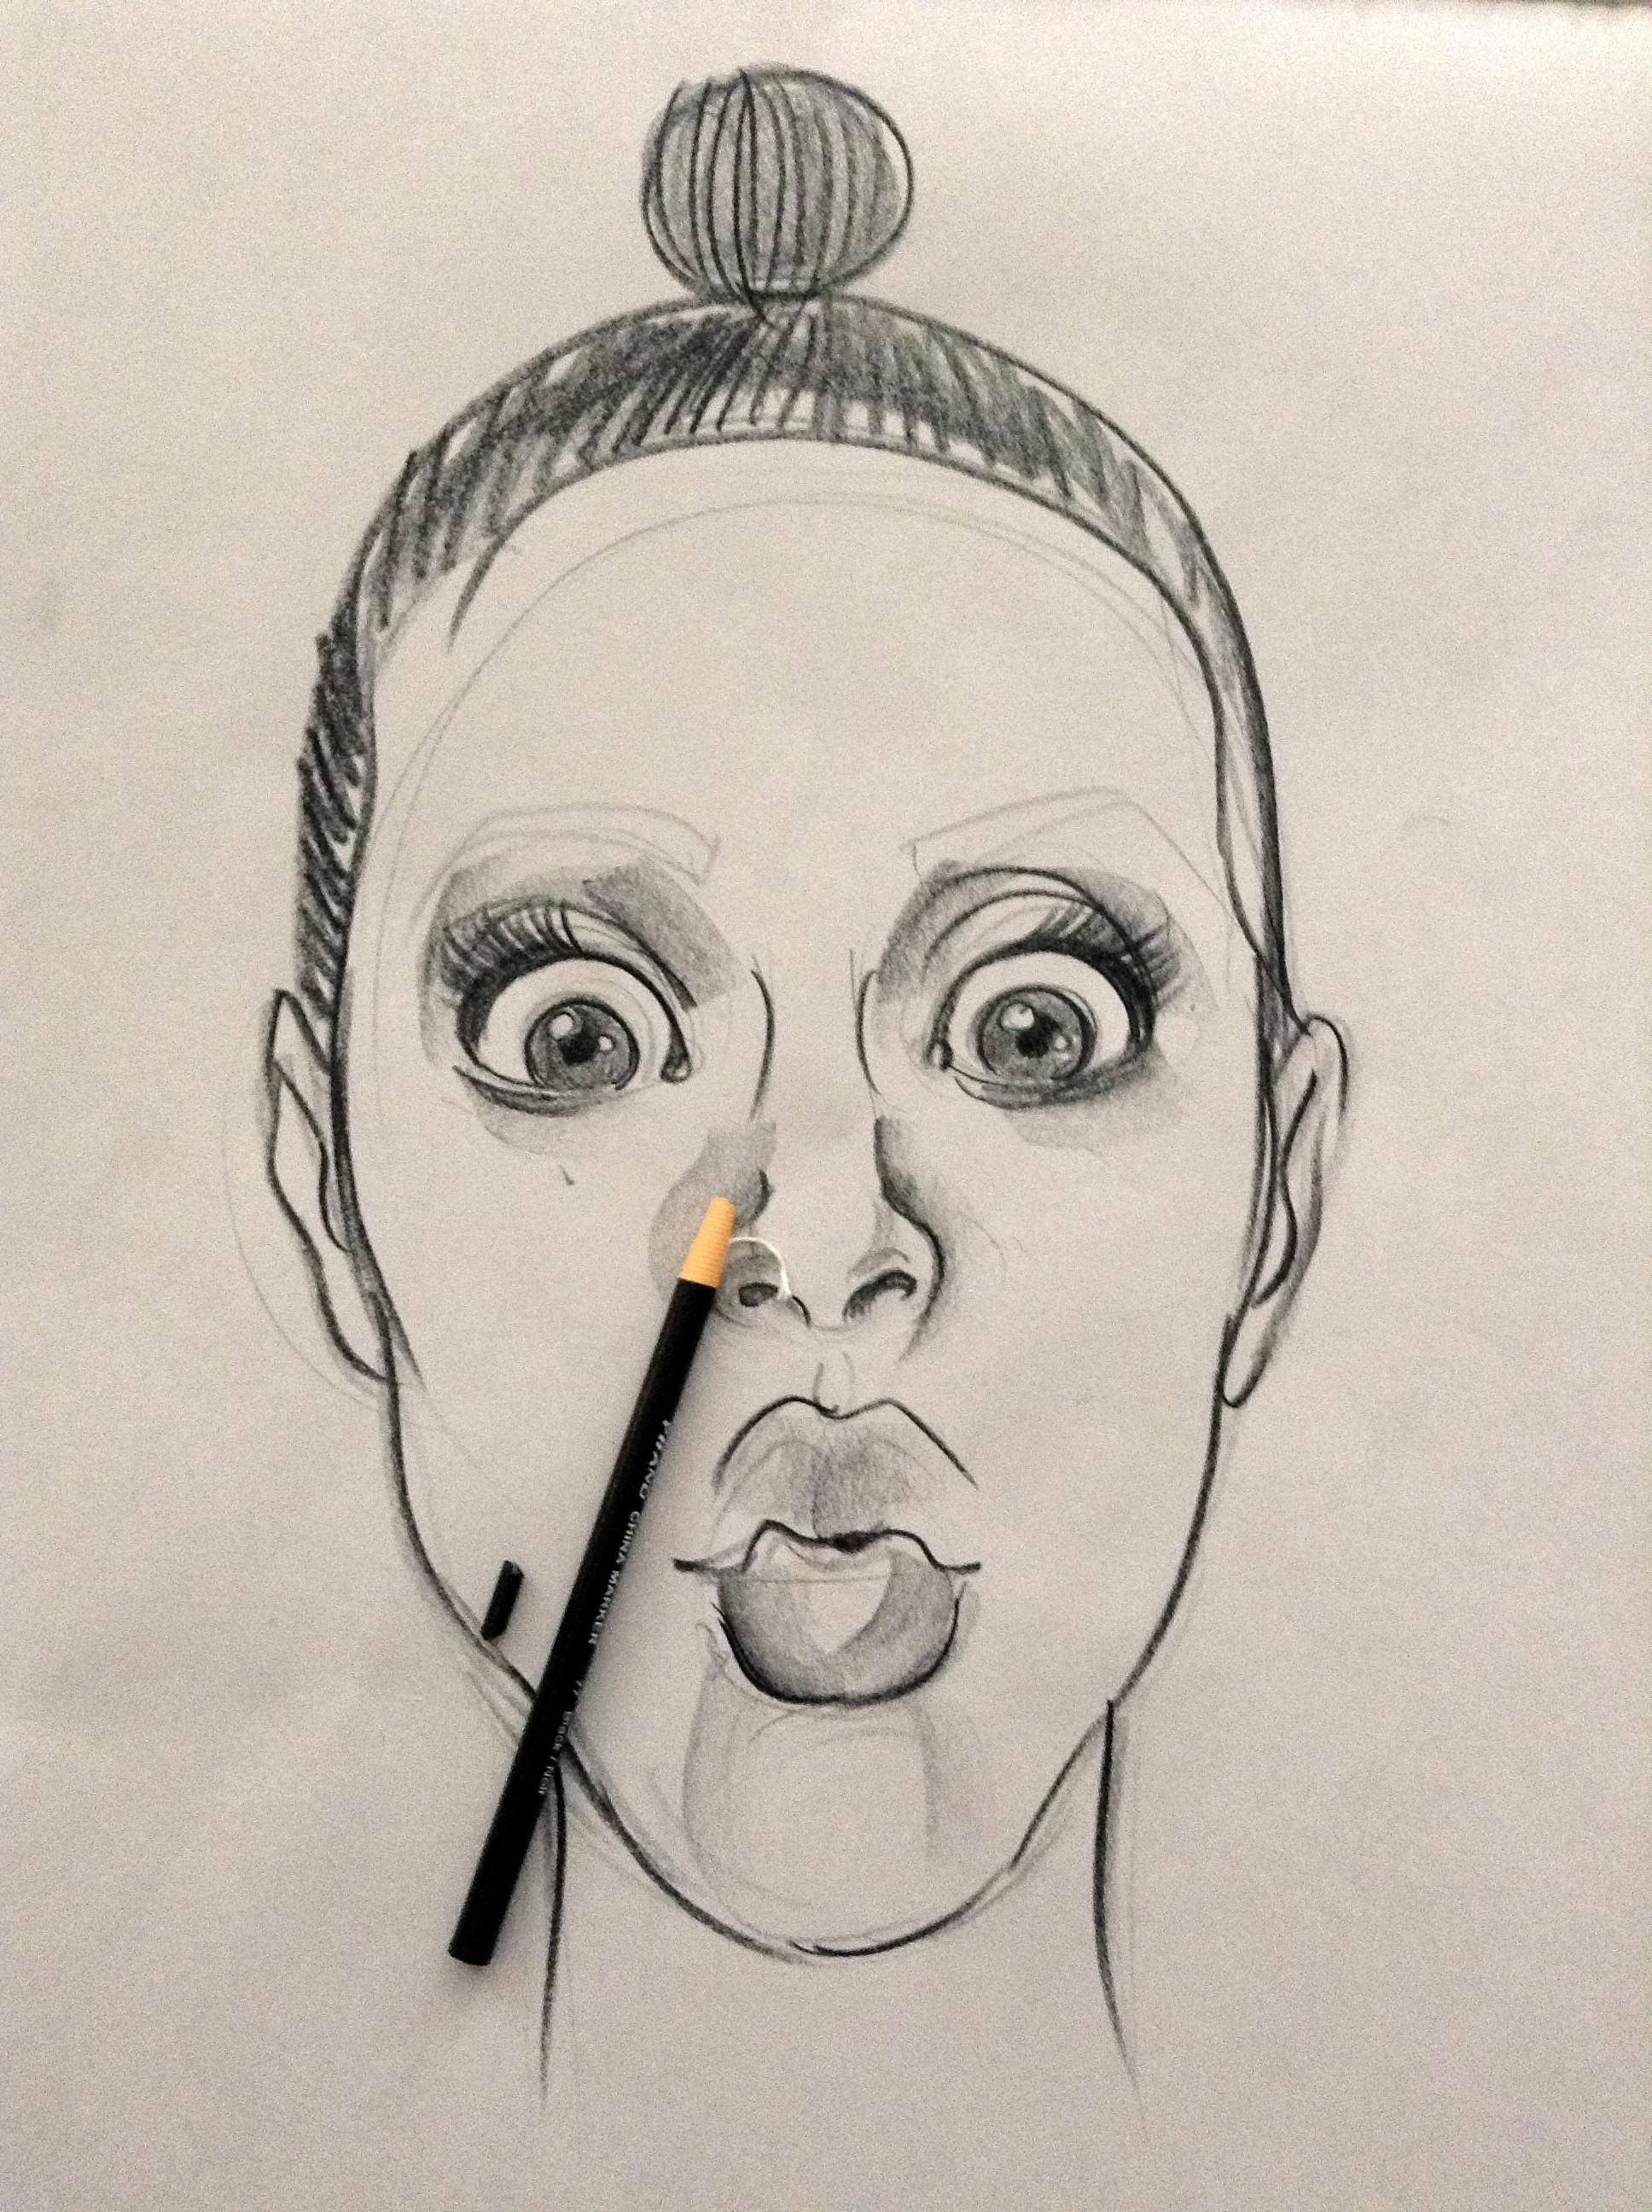 Drawn portrait street #drawing The  process #portrait